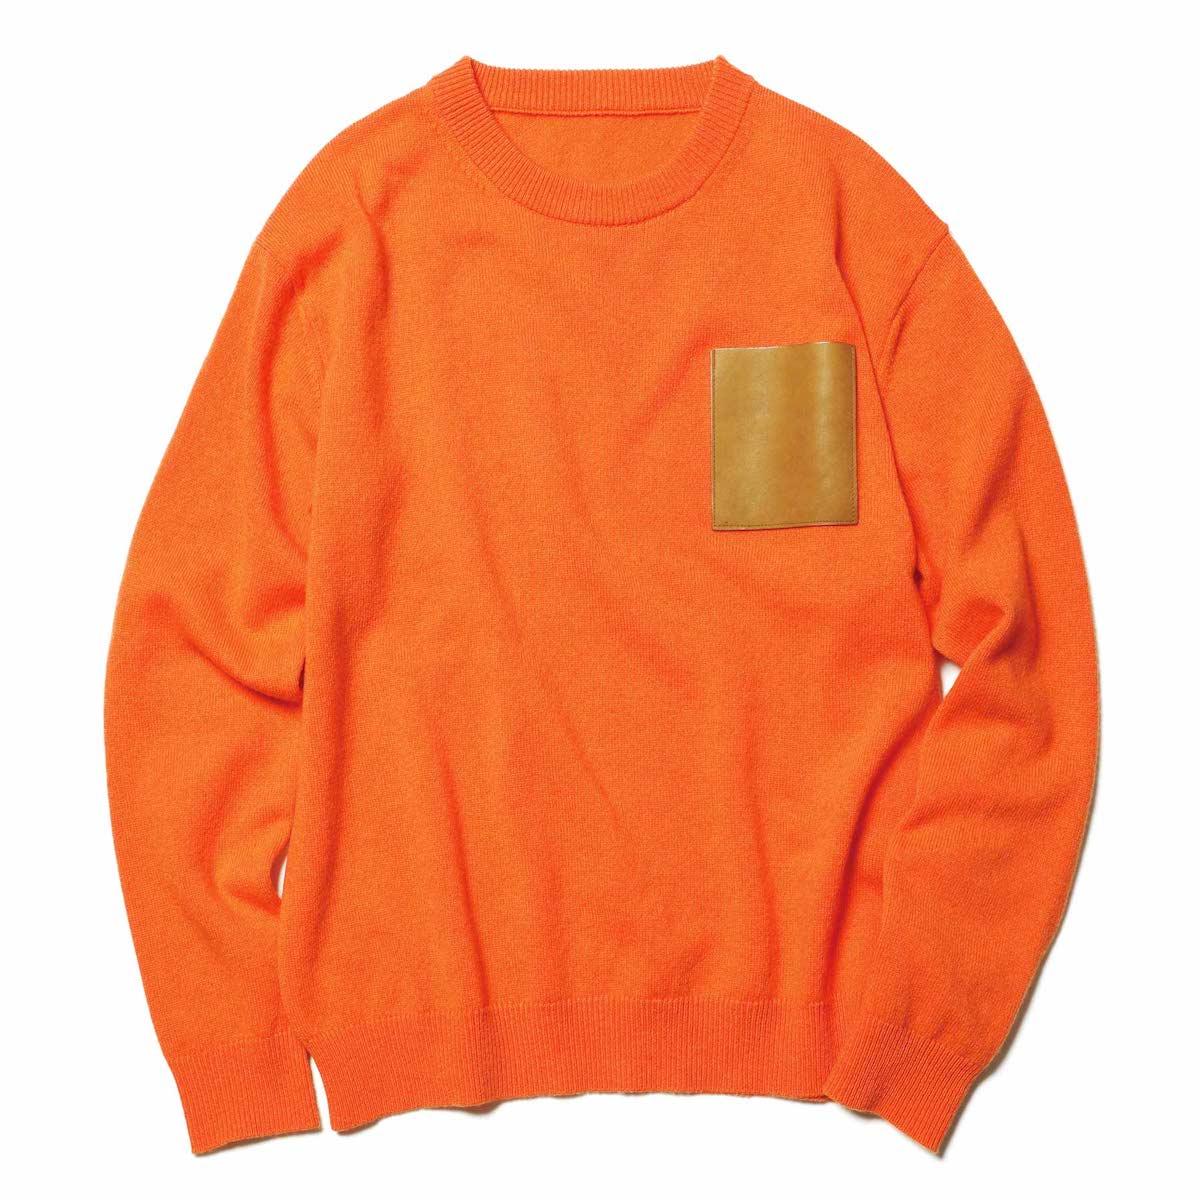 SOPHNET. / LEATHER POCKET CREW NECK KNIT (Orange)